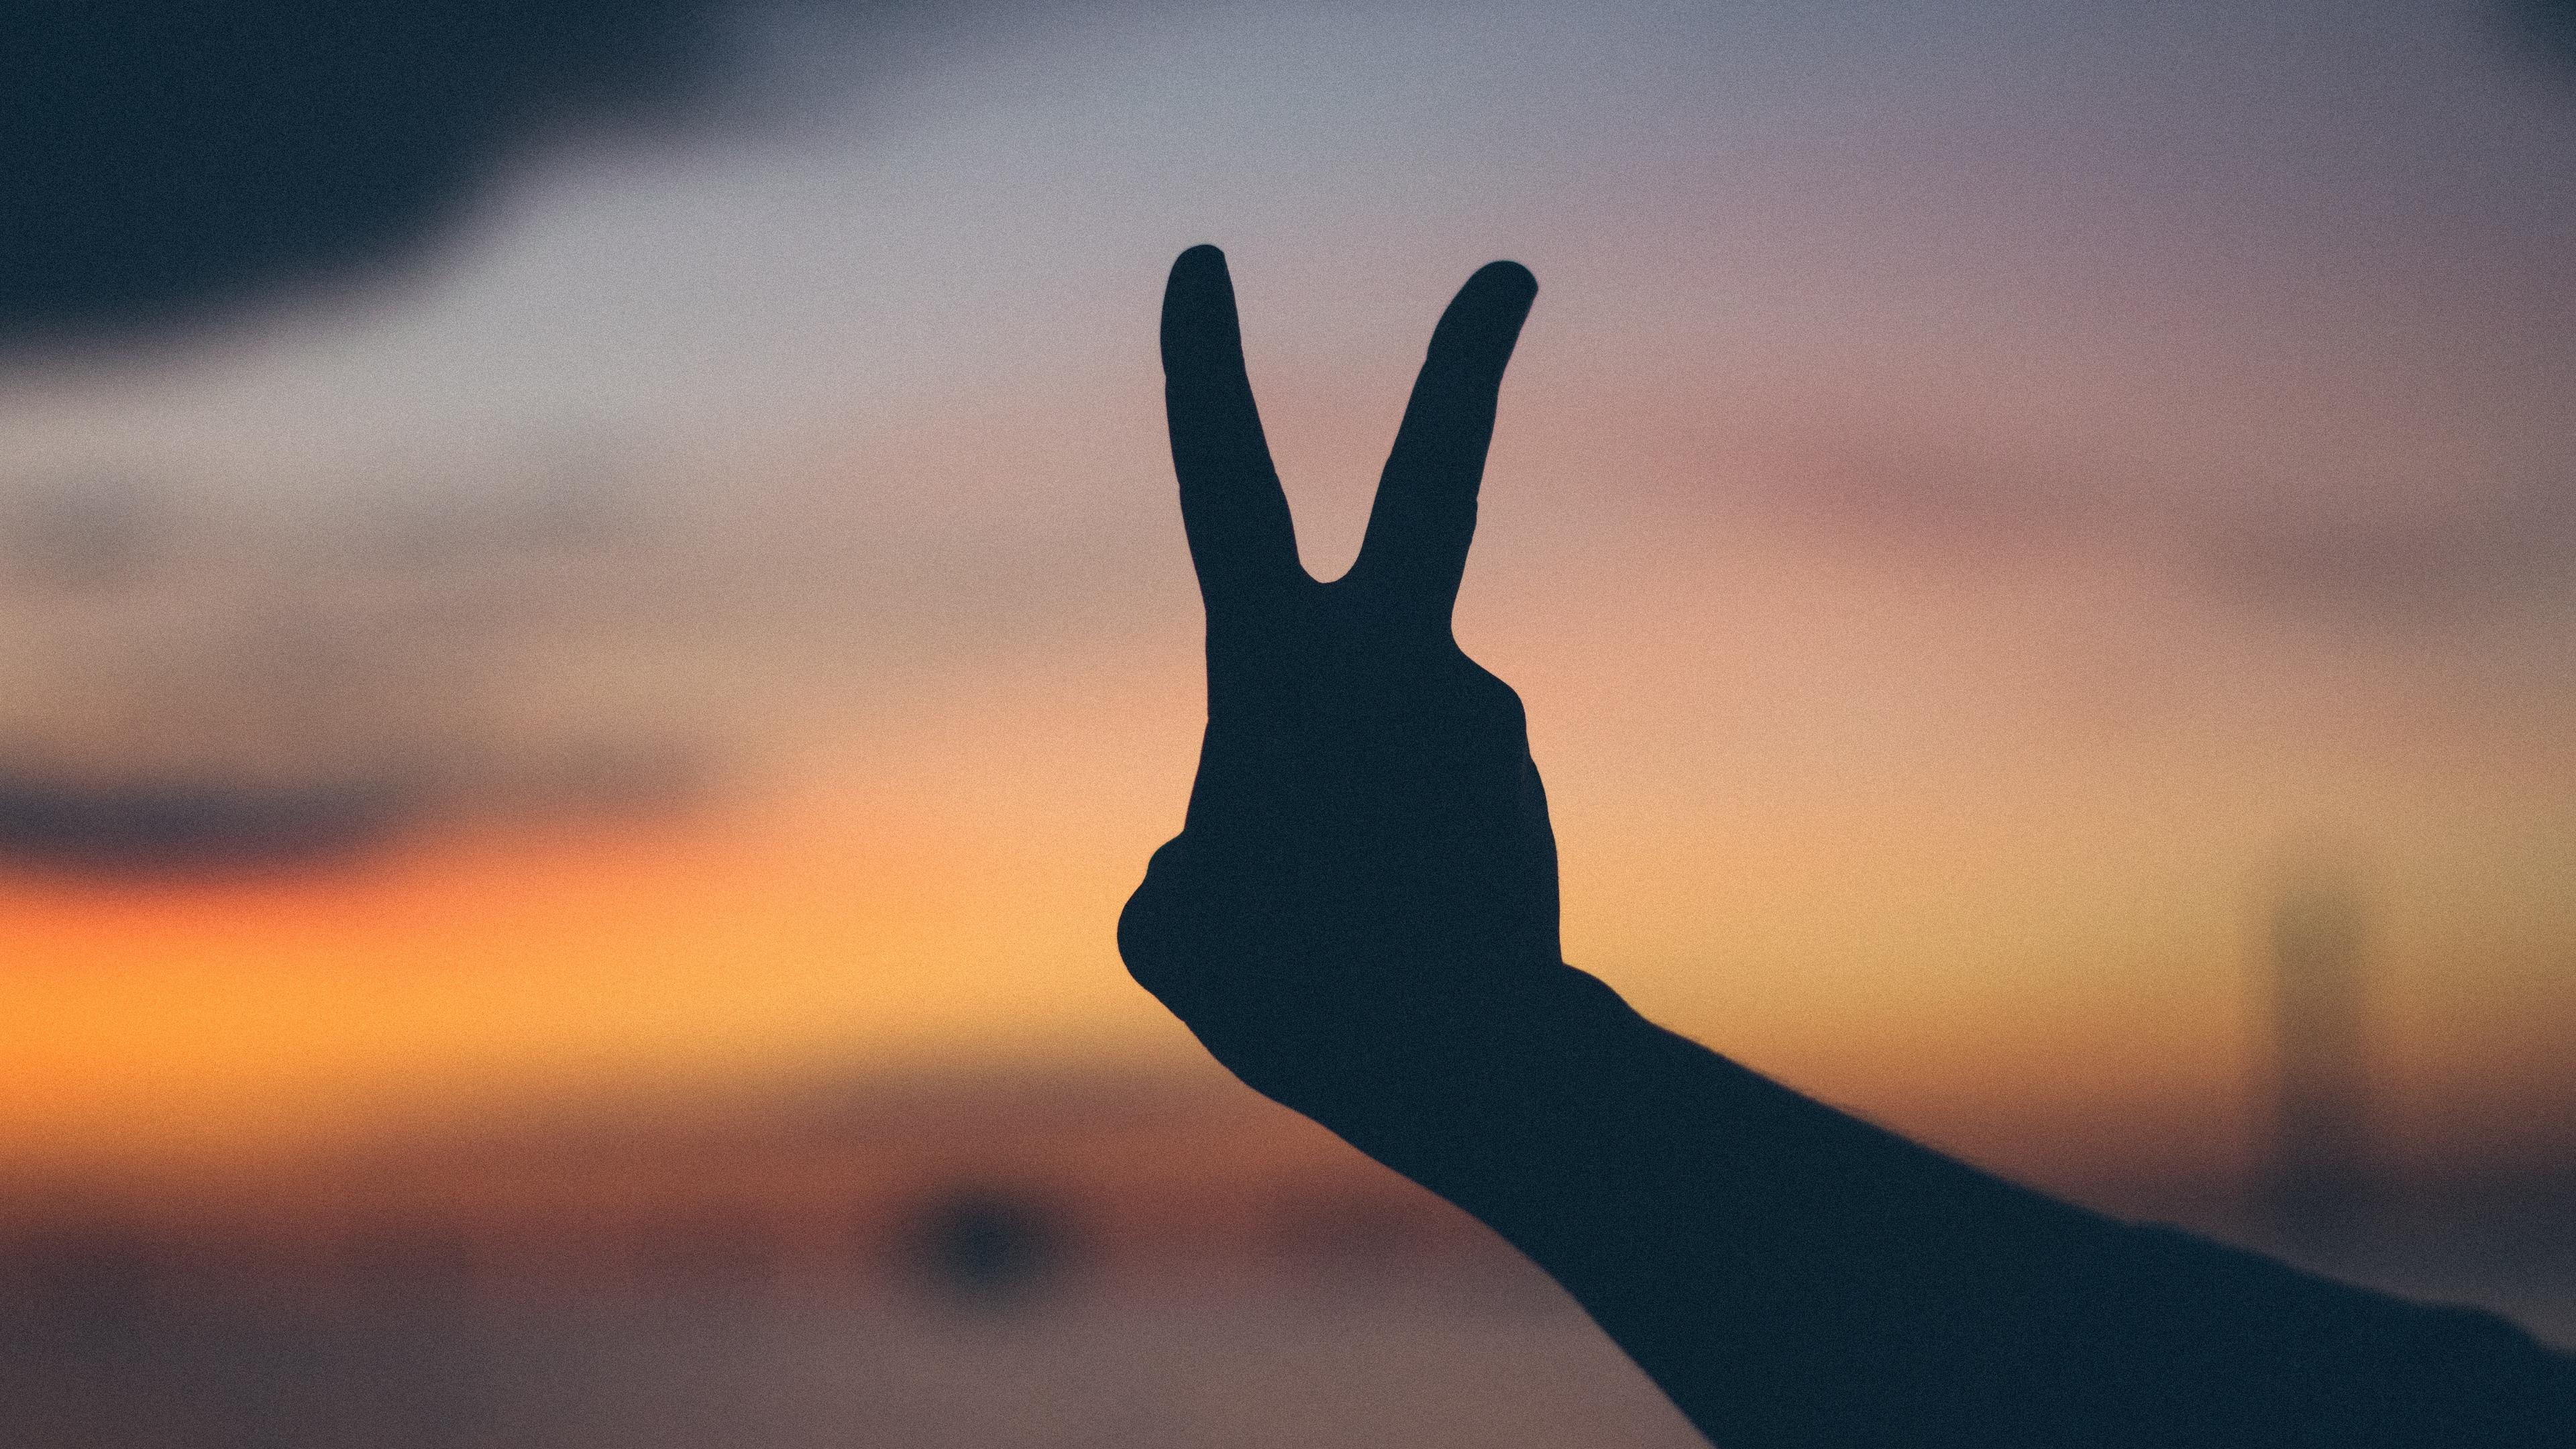 hand gesture fingers 4k 1540575322 - hand, gesture, fingers 4k - hand, gesture, Fingers